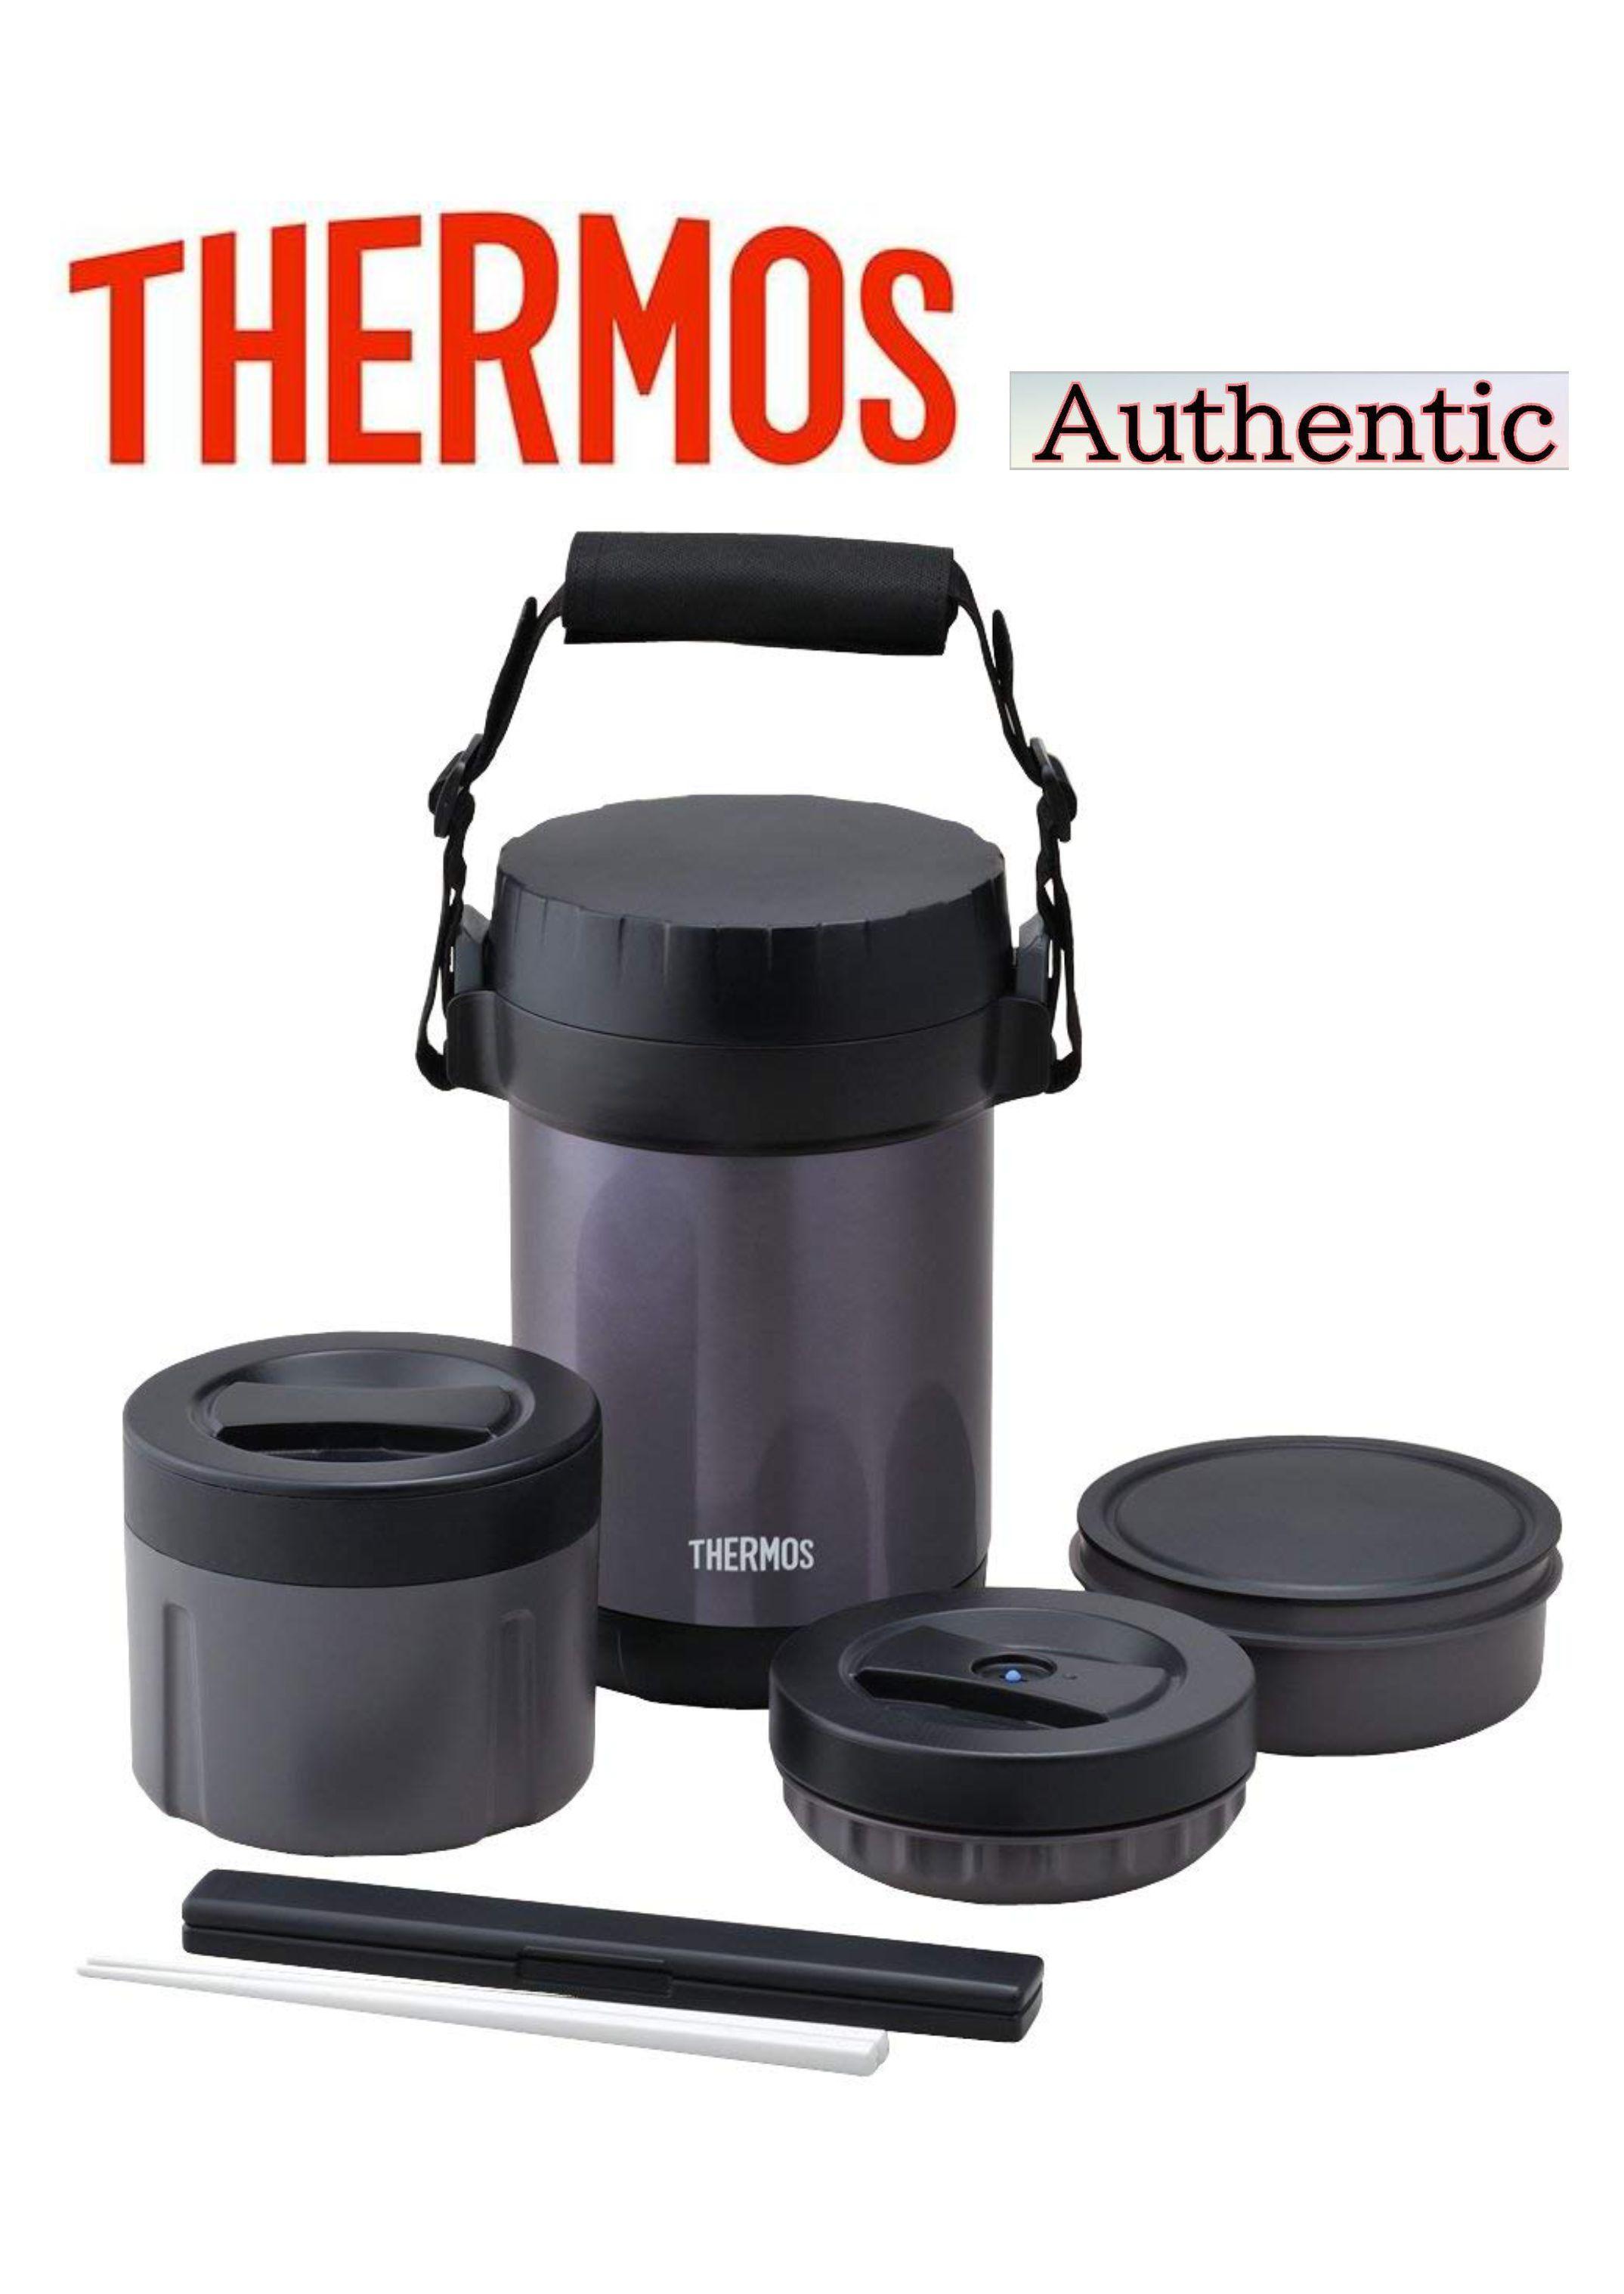 THERMOS vacuum insulated stainless steel lunch jar JBG-1801 MDB